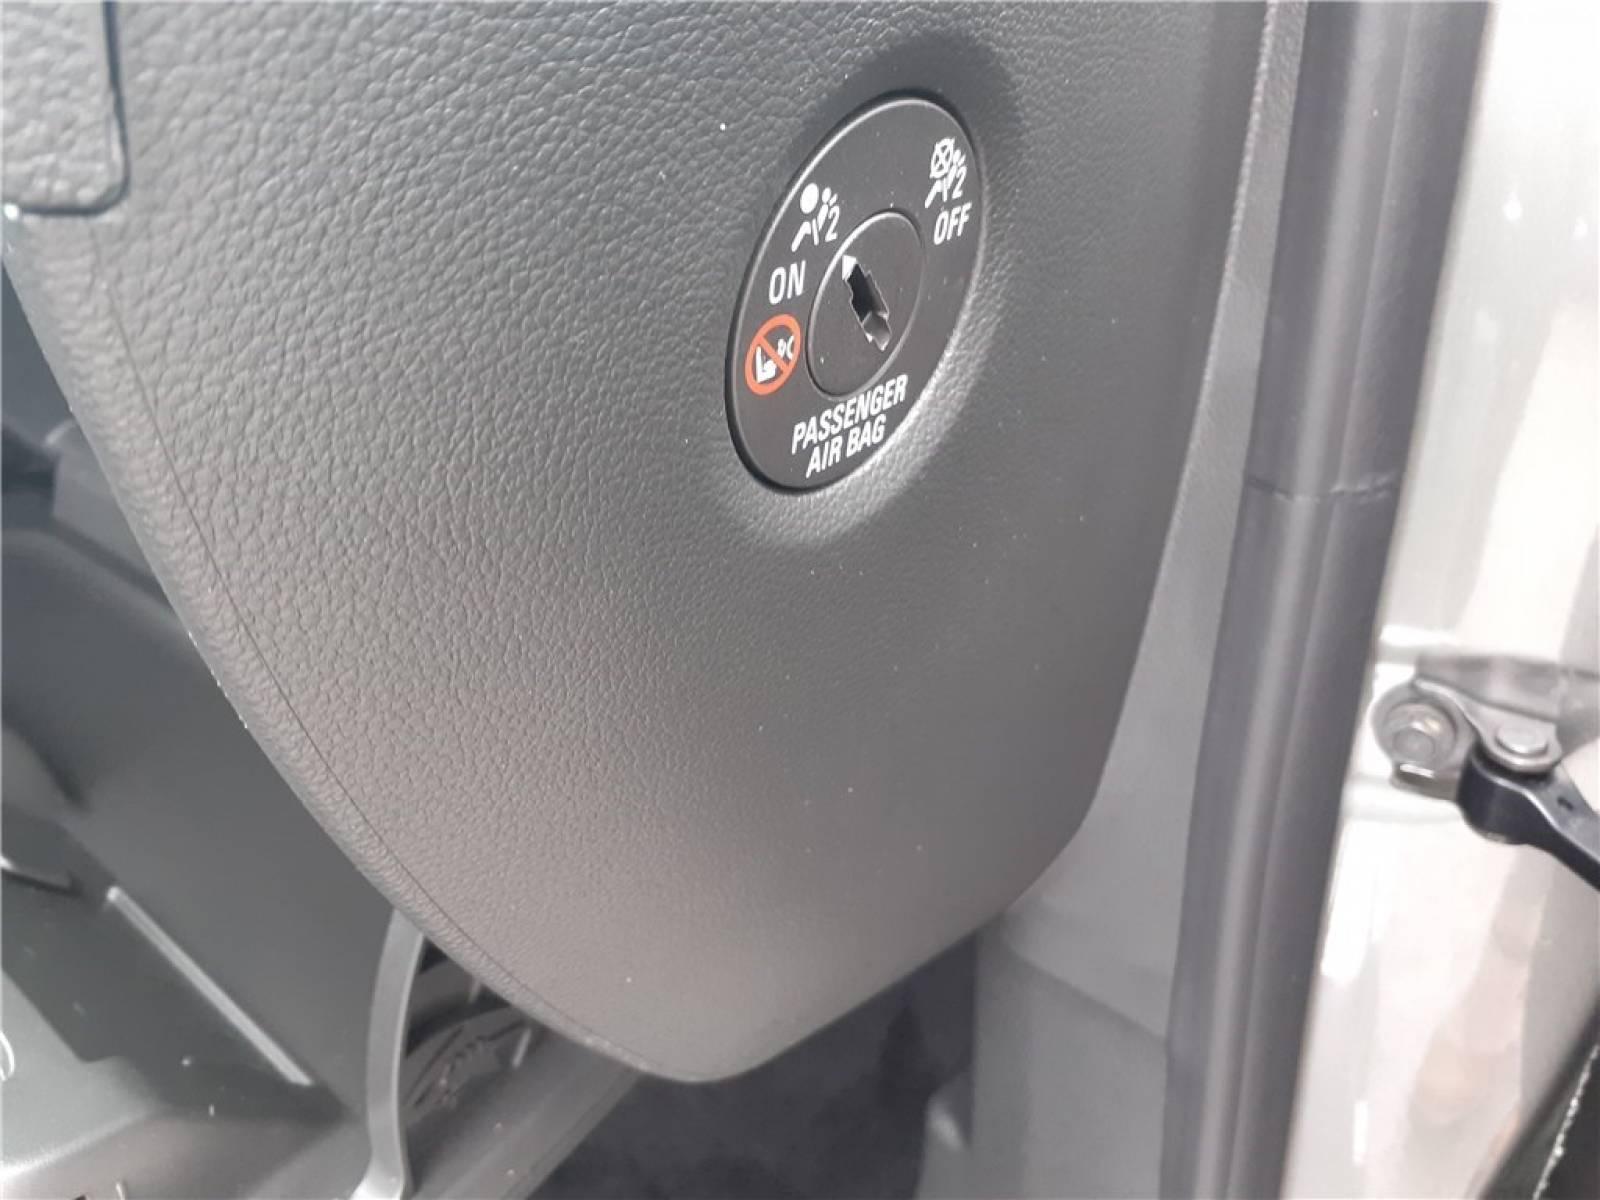 OPEL Astra Sports Tourer 1.5 Diesel 122 ch BVA9 - véhicule d'occasion - Groupe Guillet - Opel Magicauto - Chalon-sur-Saône - 71380 - Saint-Marcel - 56